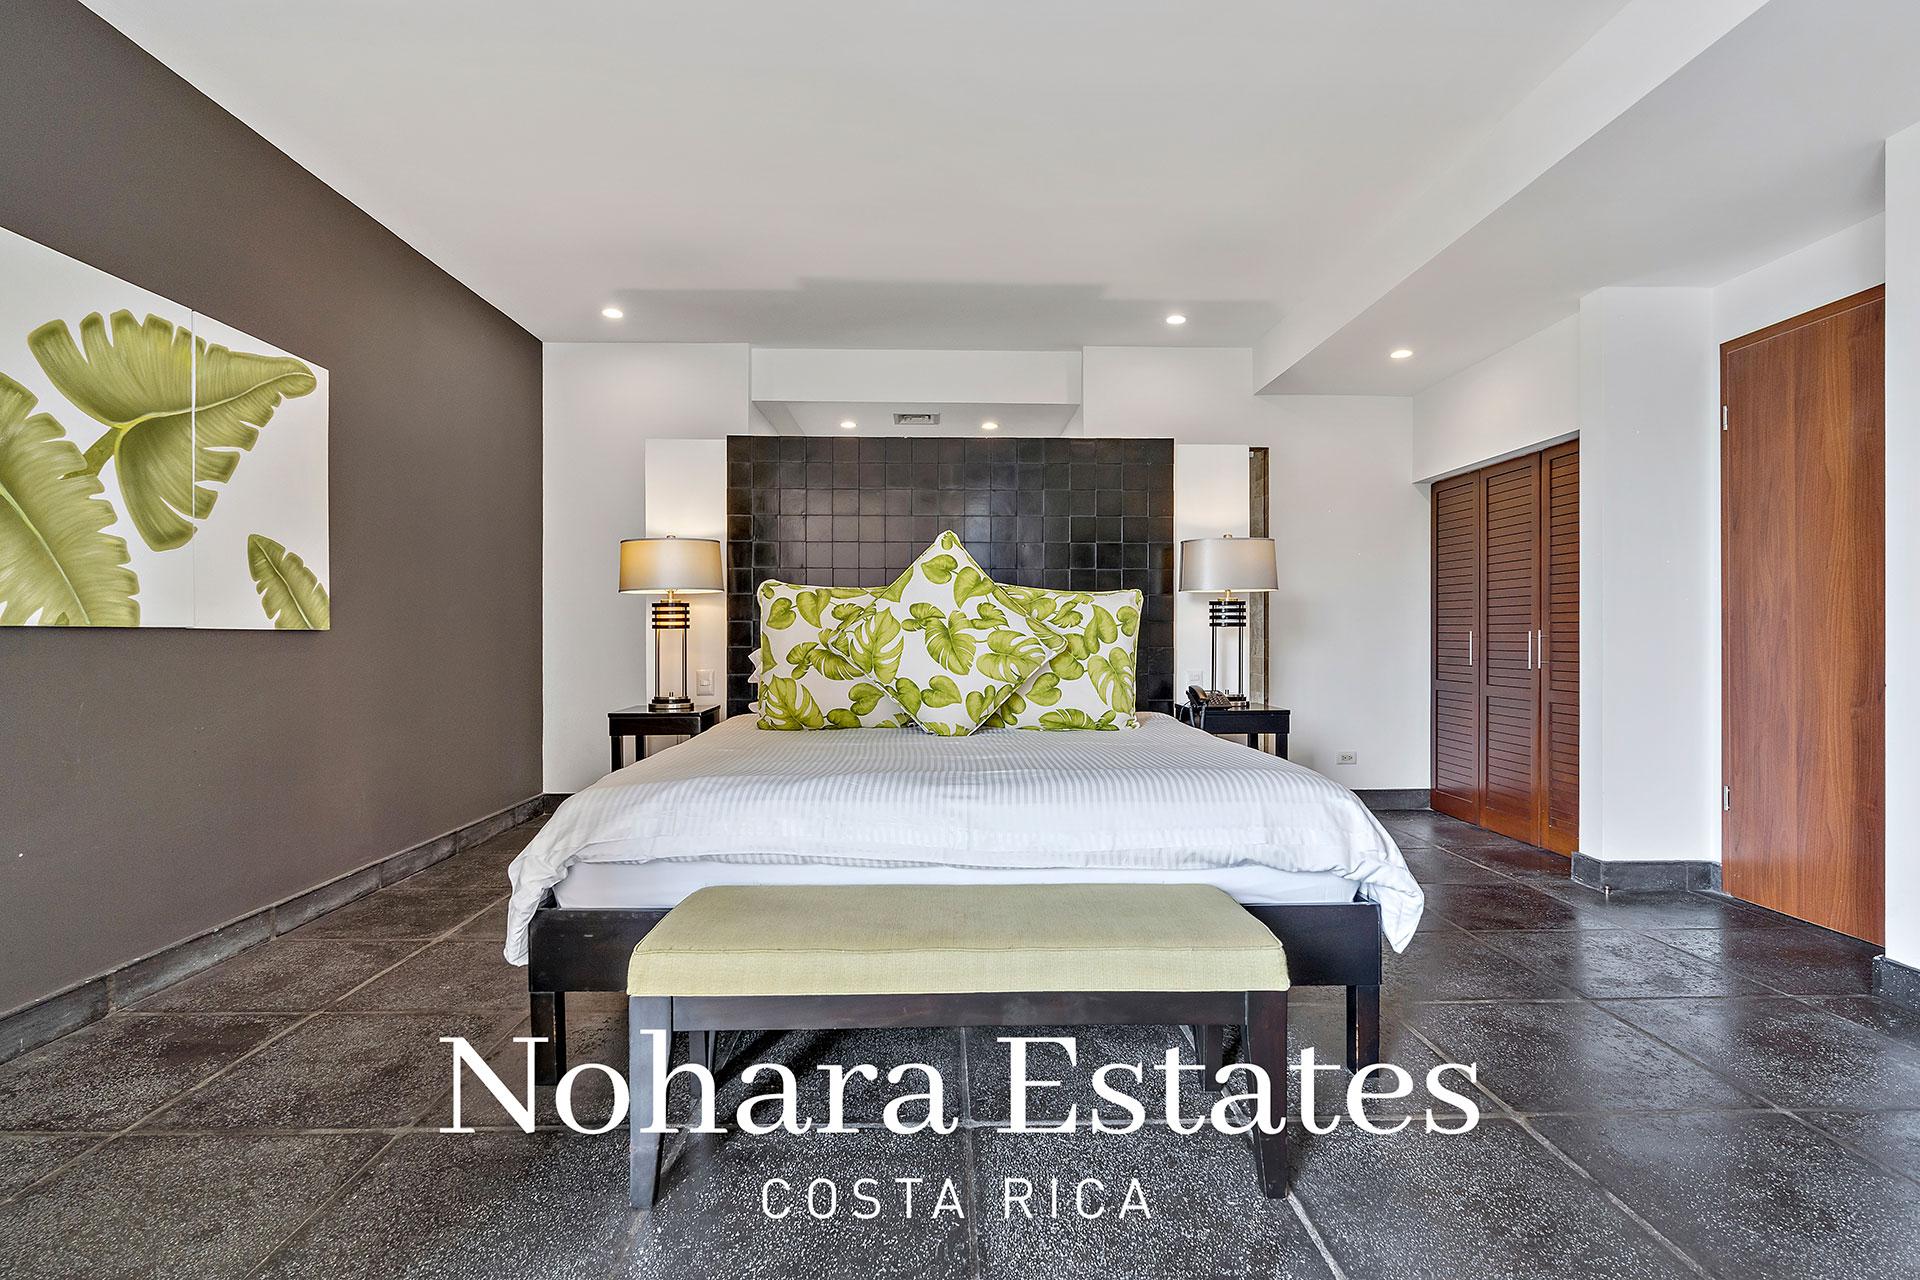 Nohara Estates Costa Rica 122 Apartment Quepos Los Altos 14